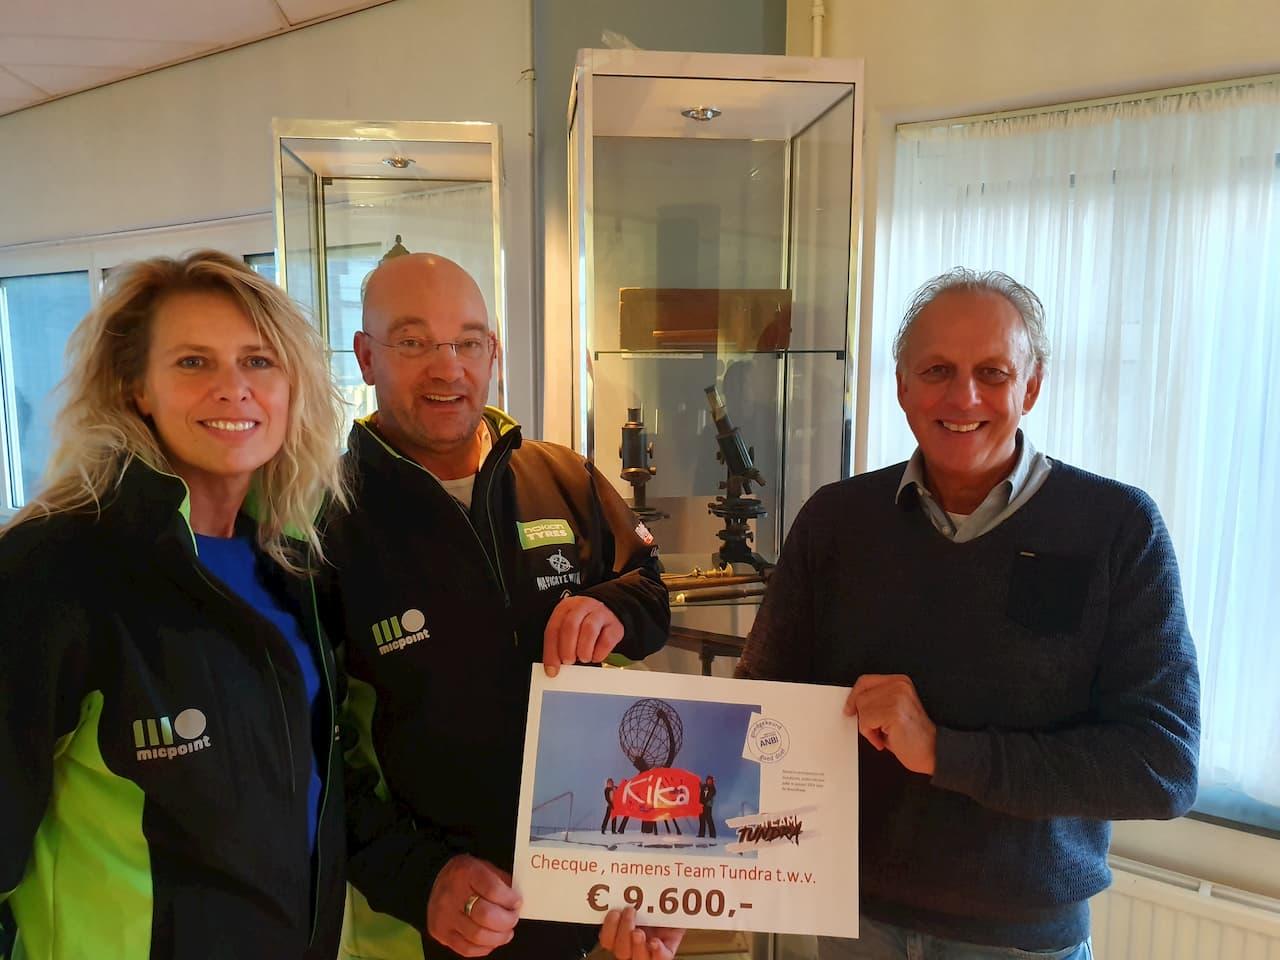 Stichting Team Tundra | Goede doelen 2019 | KiKa